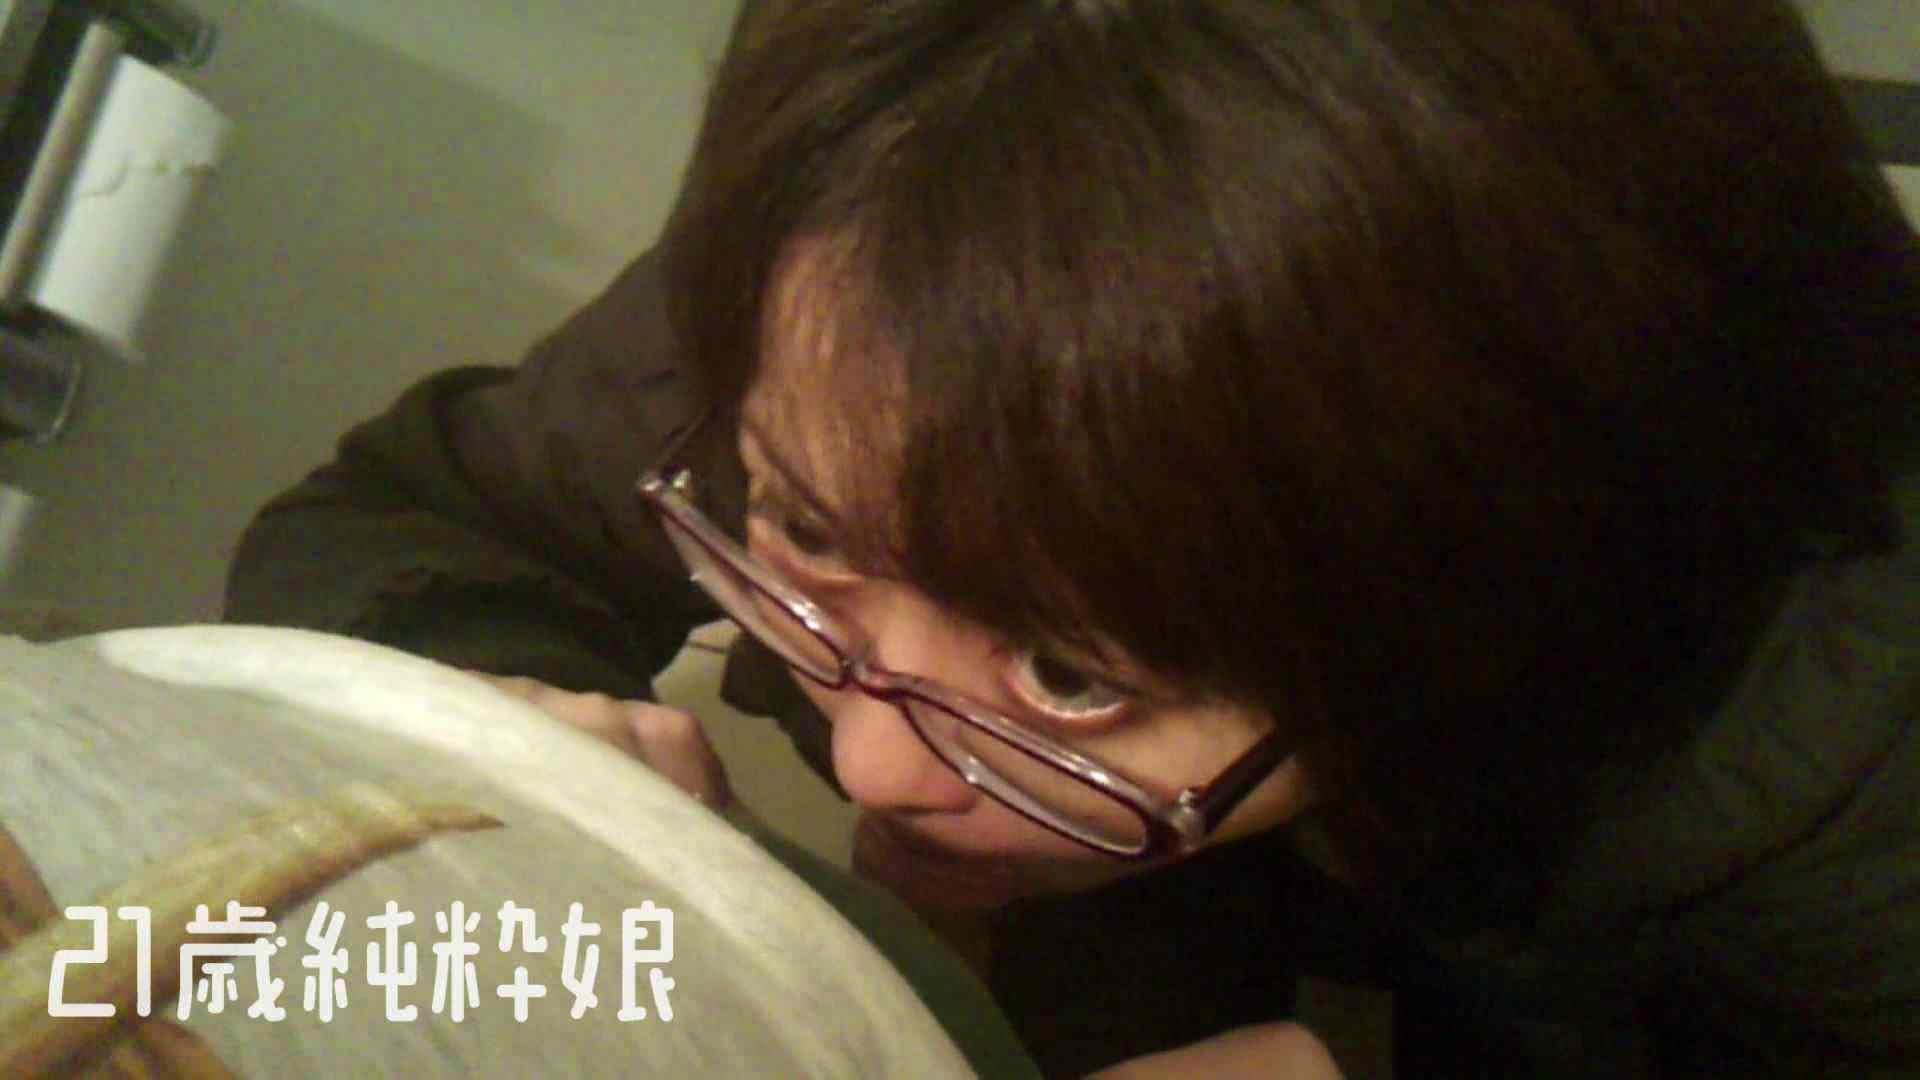 Gカップ21歳純粋嬢第2弾Vol.5 性欲丸出し | 学校  101pic 34